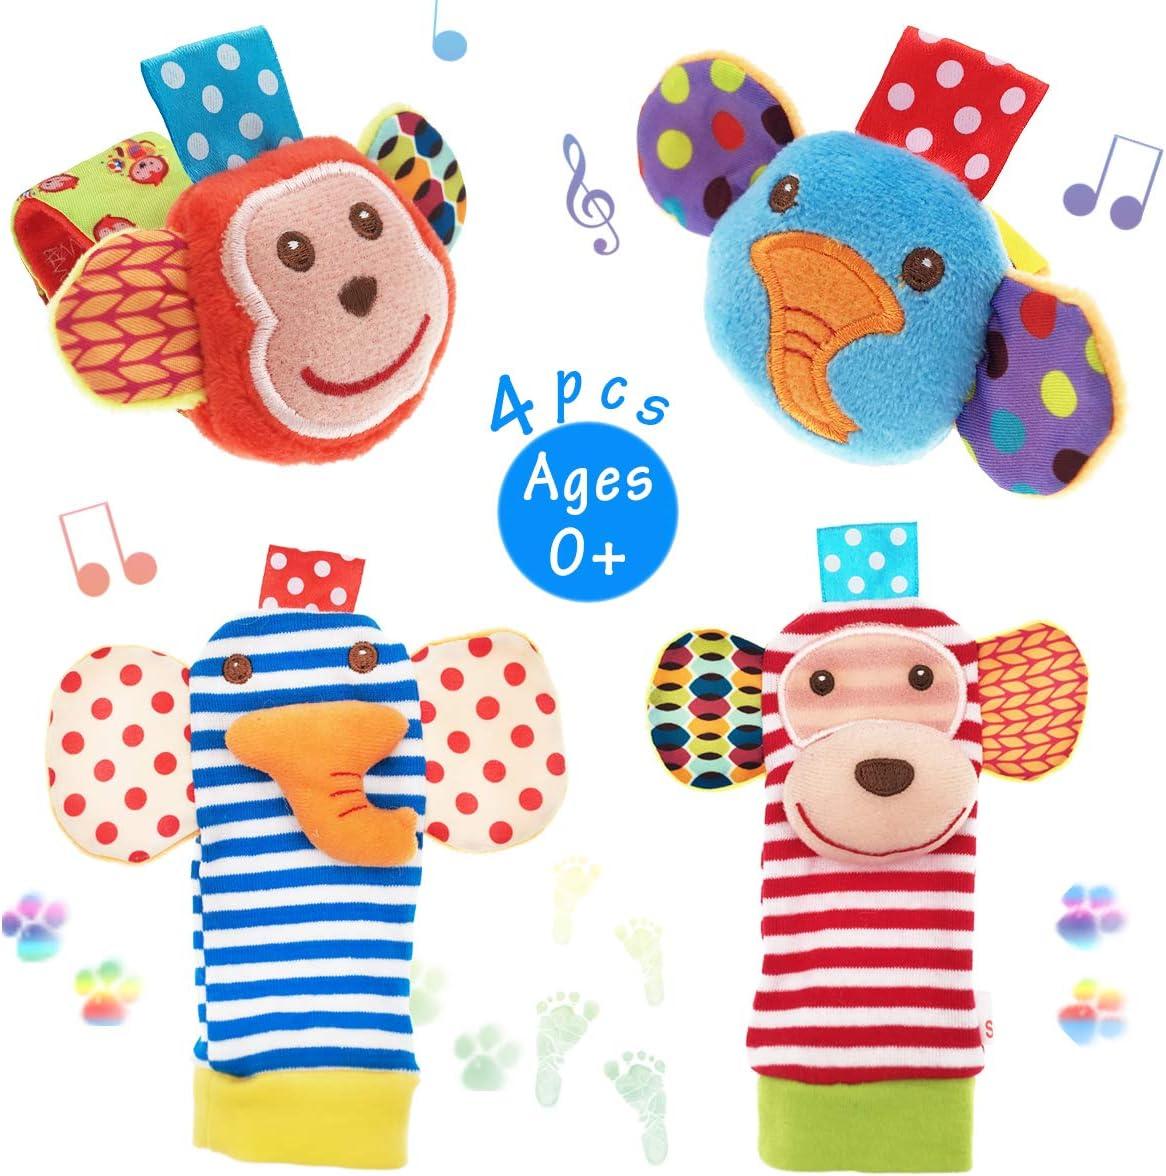 Foot Finders /& Wrist Rattles for Infants Developmental Texture Toys for Babies /& Infant Toy Socks /& Baby Wrist Rattle Newborn Girls /& Boys Boy Girl Toys 0-3 Months Zebra /& Giraffe